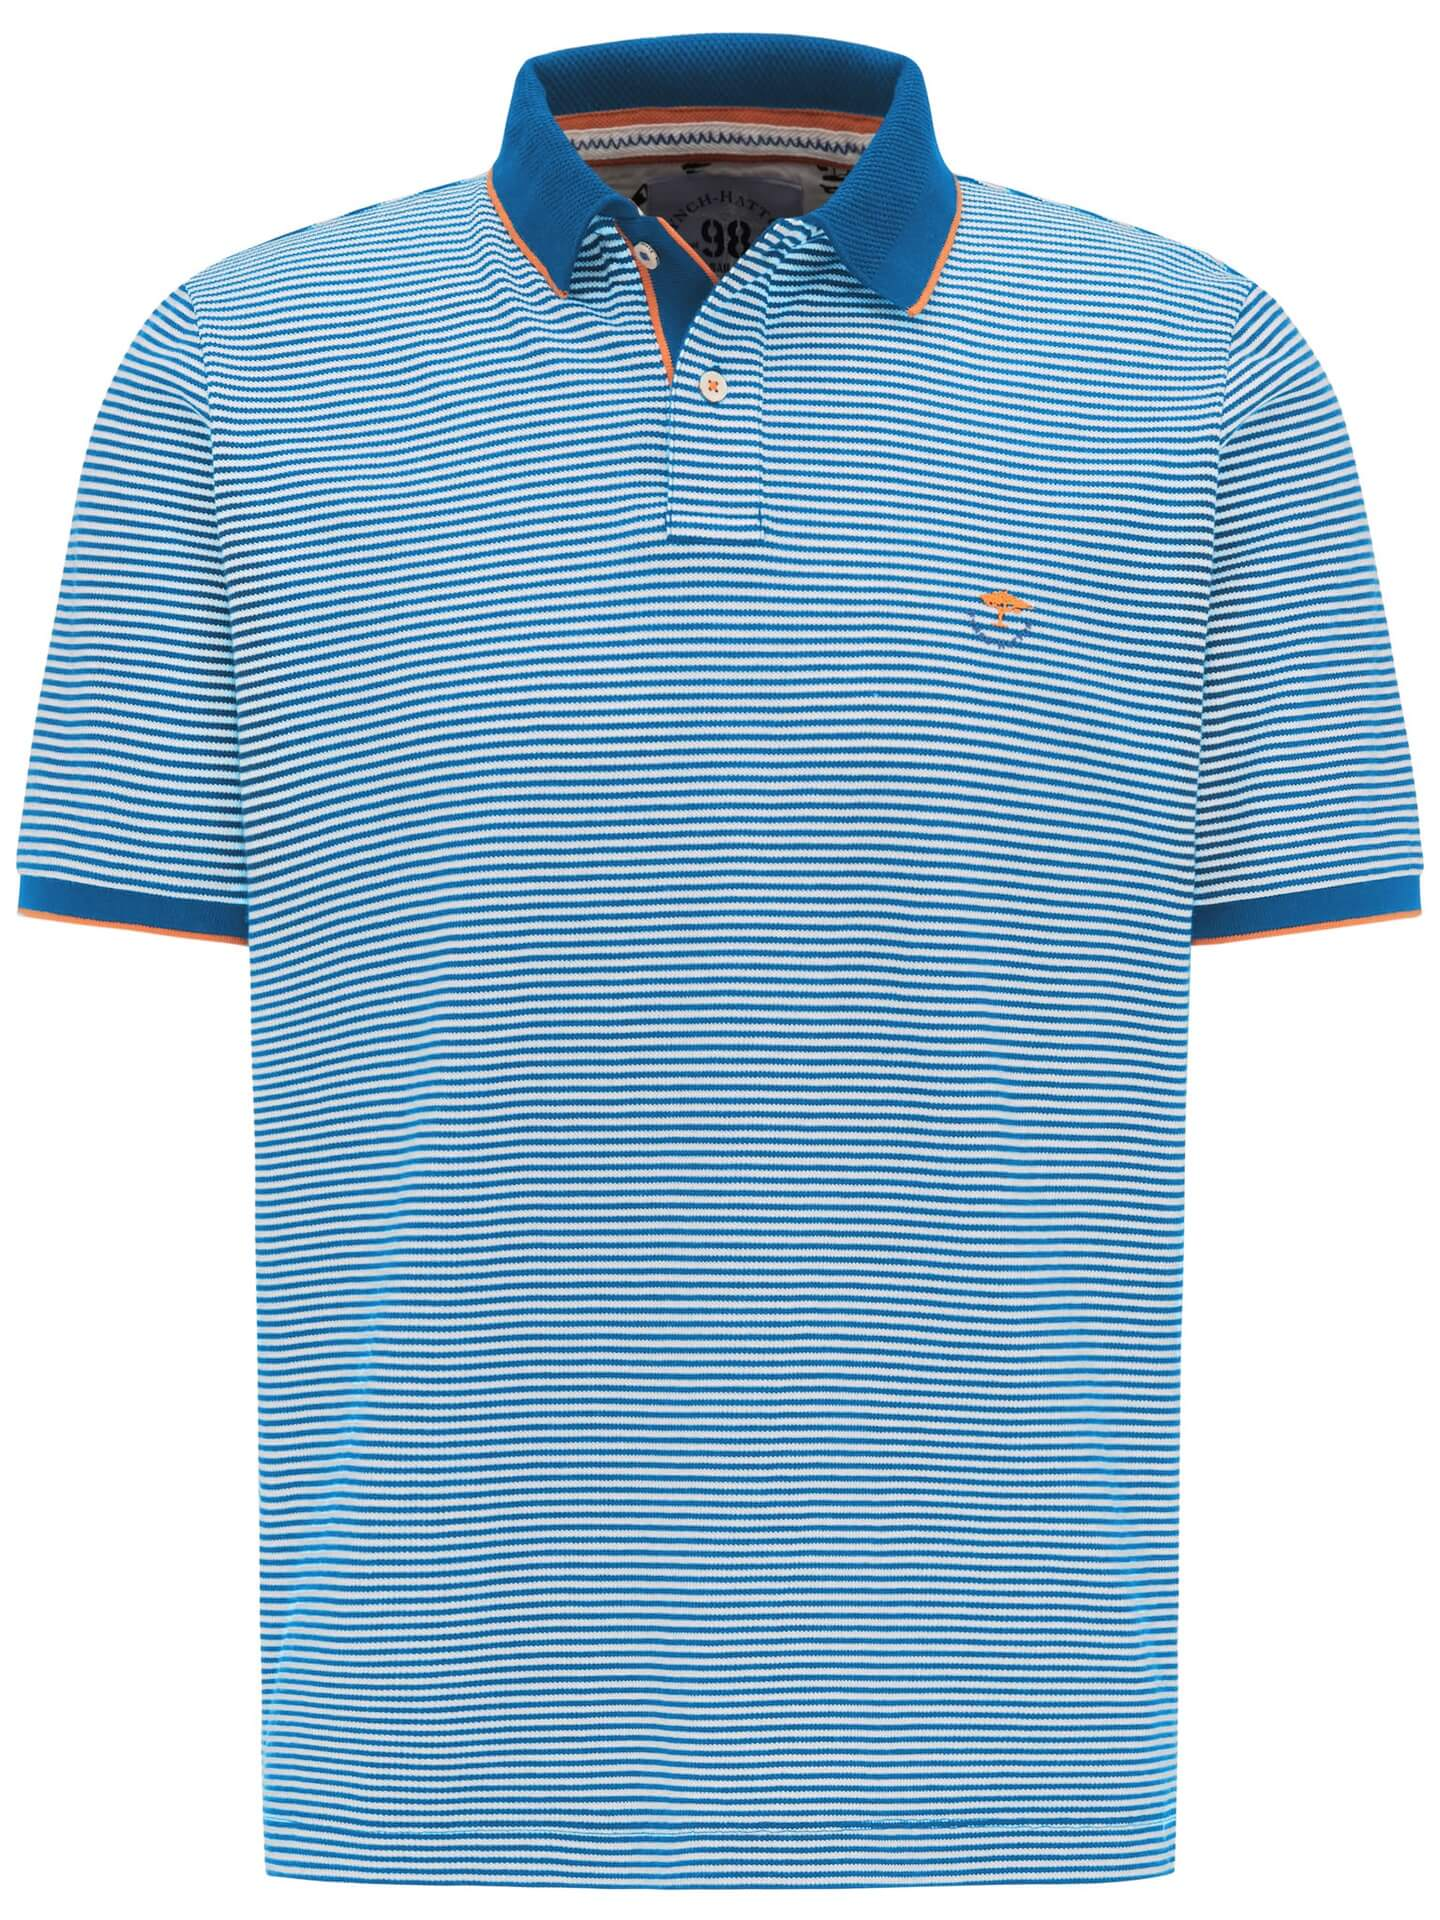 Fynch Hatton Striped Polo Shirt